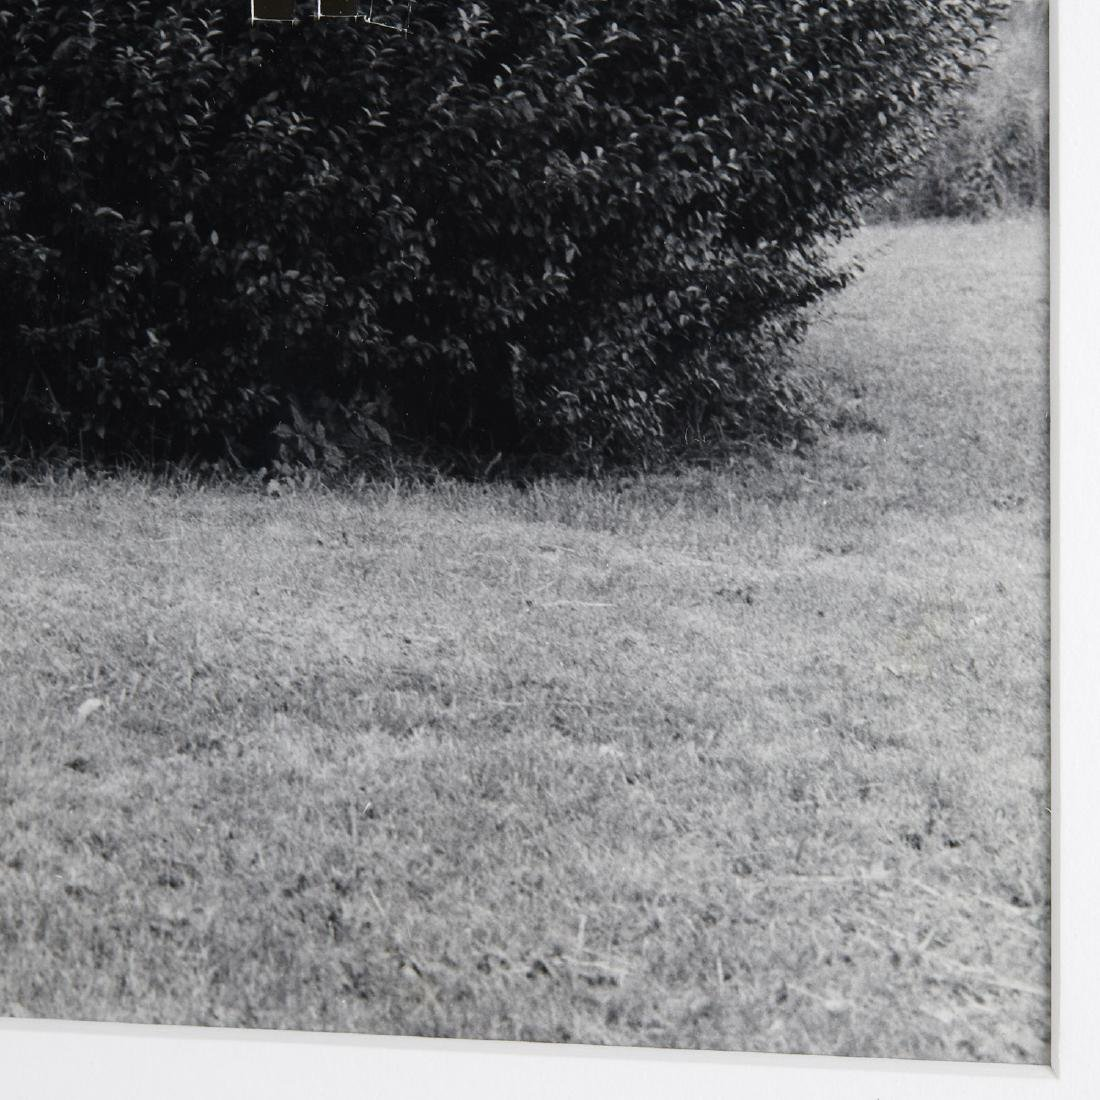 William Wegman, photograph - 5